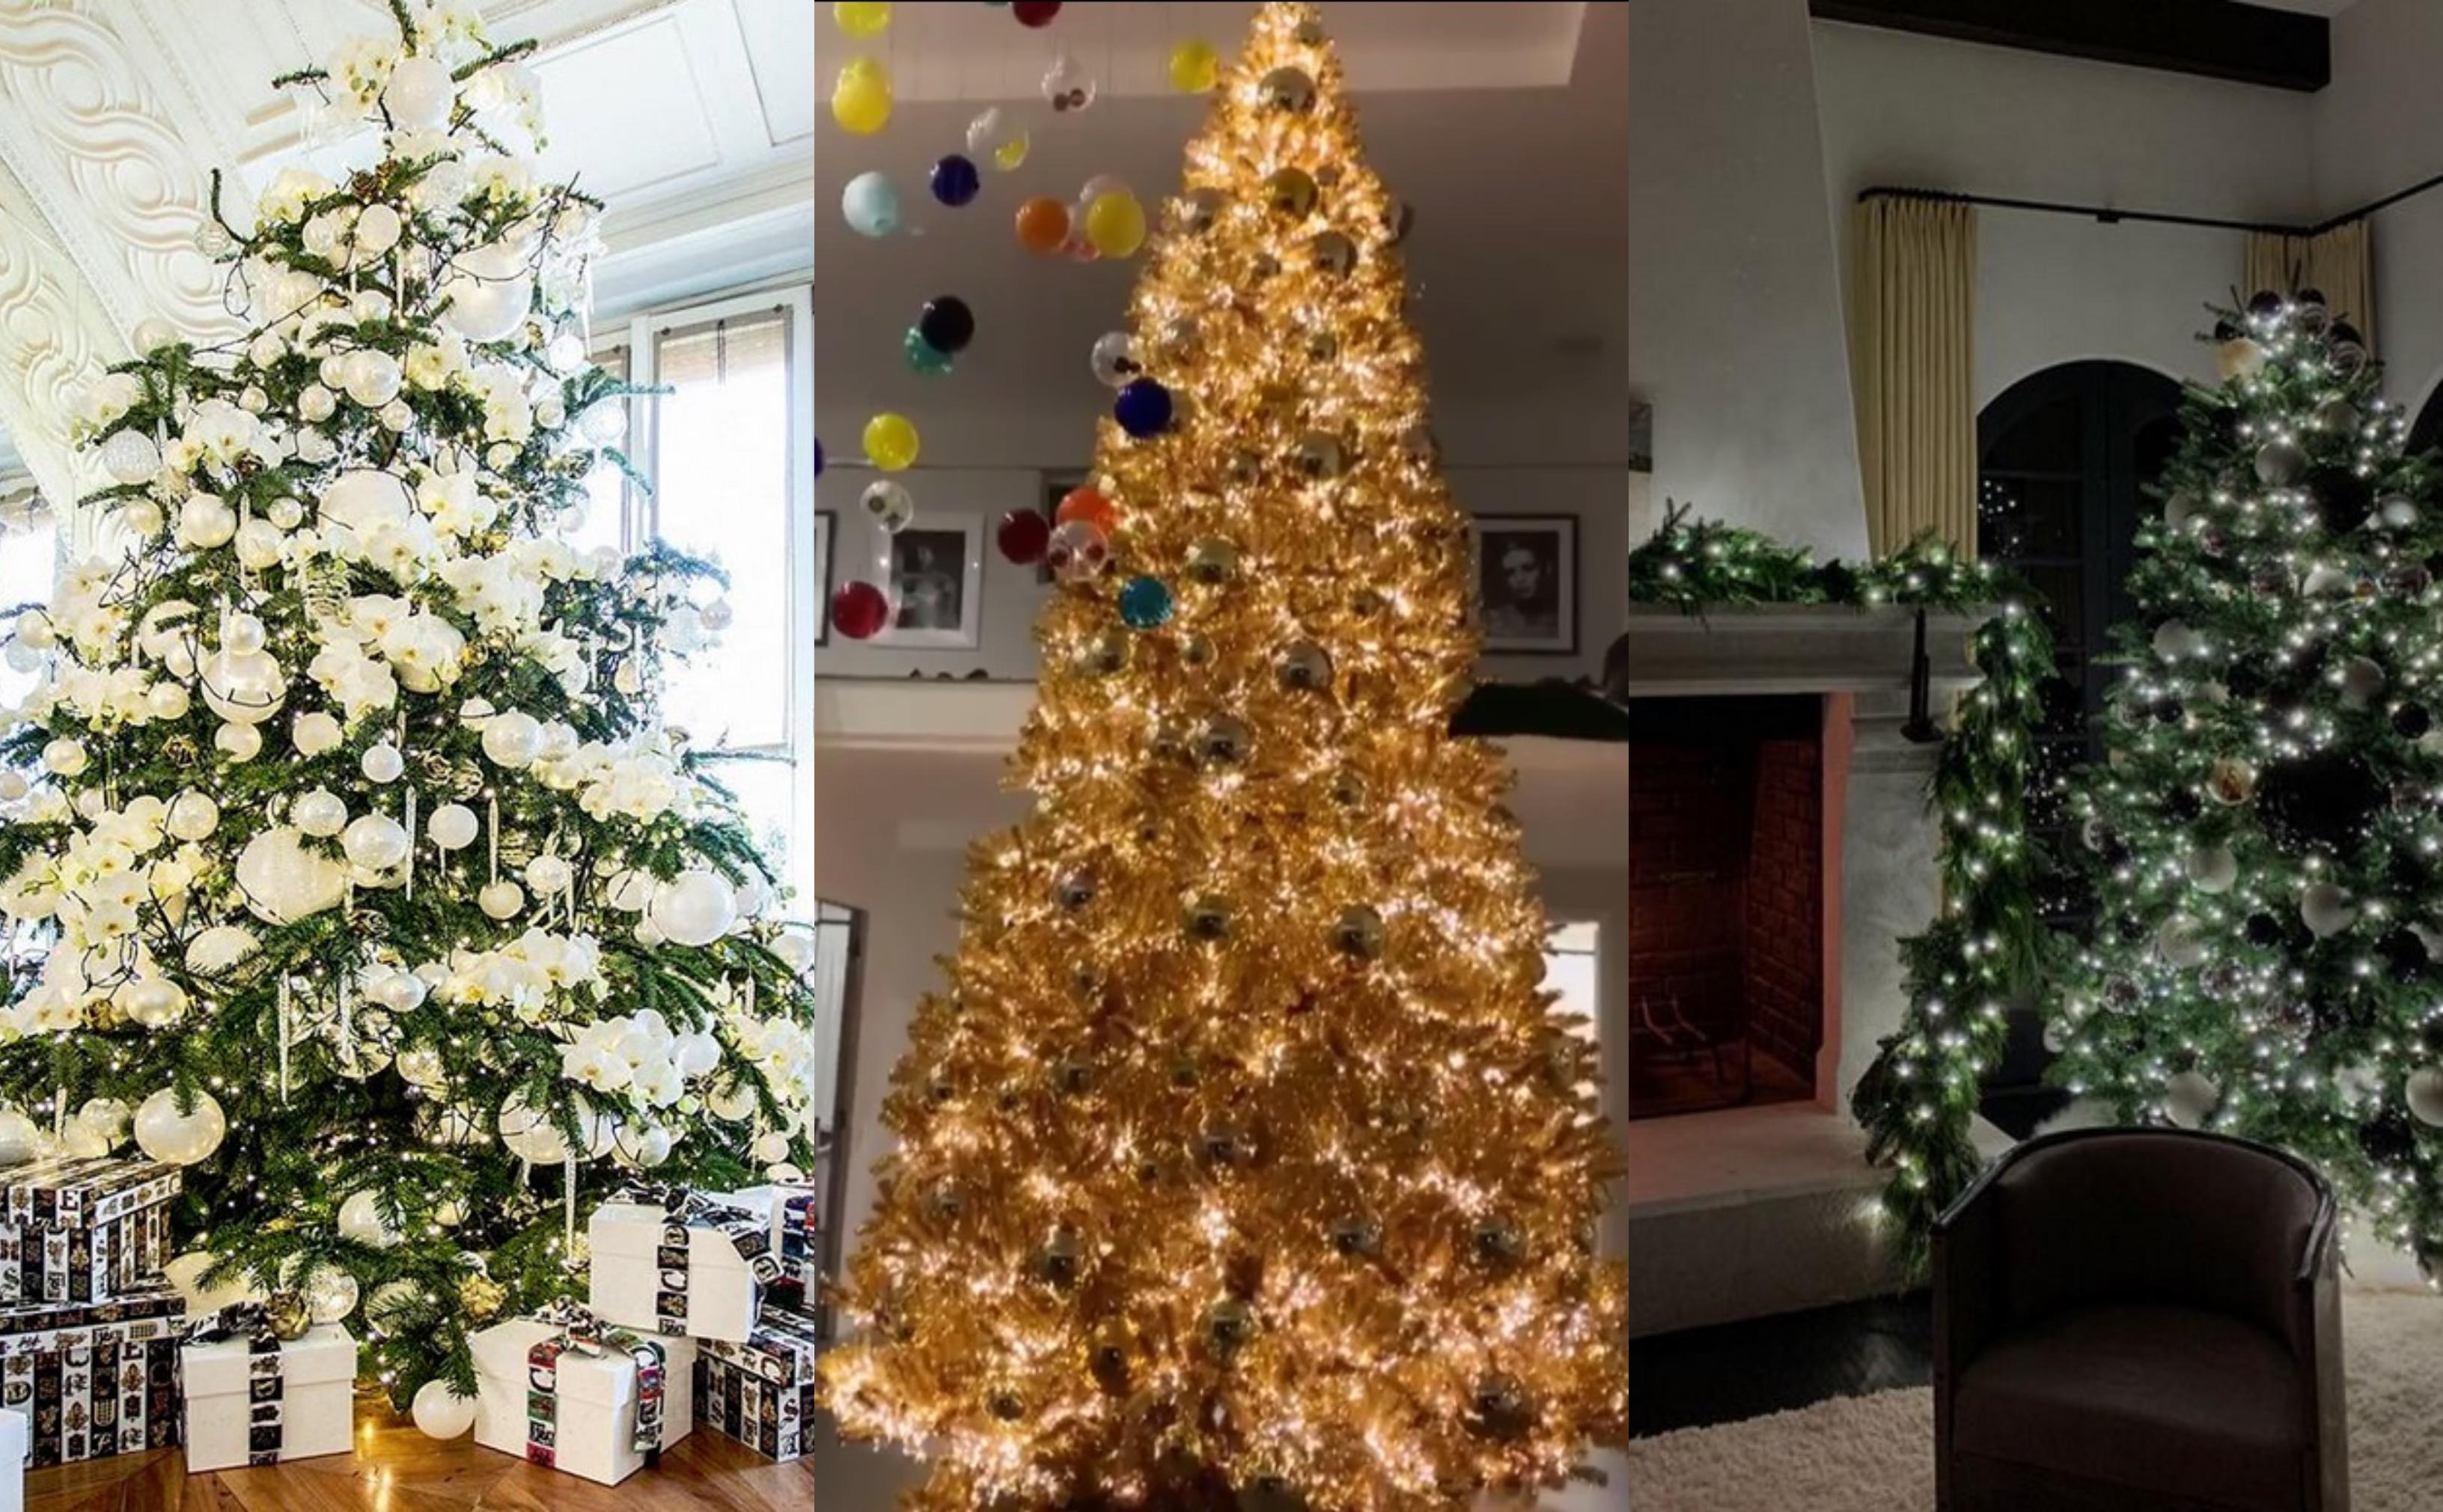 Oh (celebrity) Christmas tree: 14 διεθνείς stars μας δείχνουν το χριστουγεννιάτικο δέντρο τους